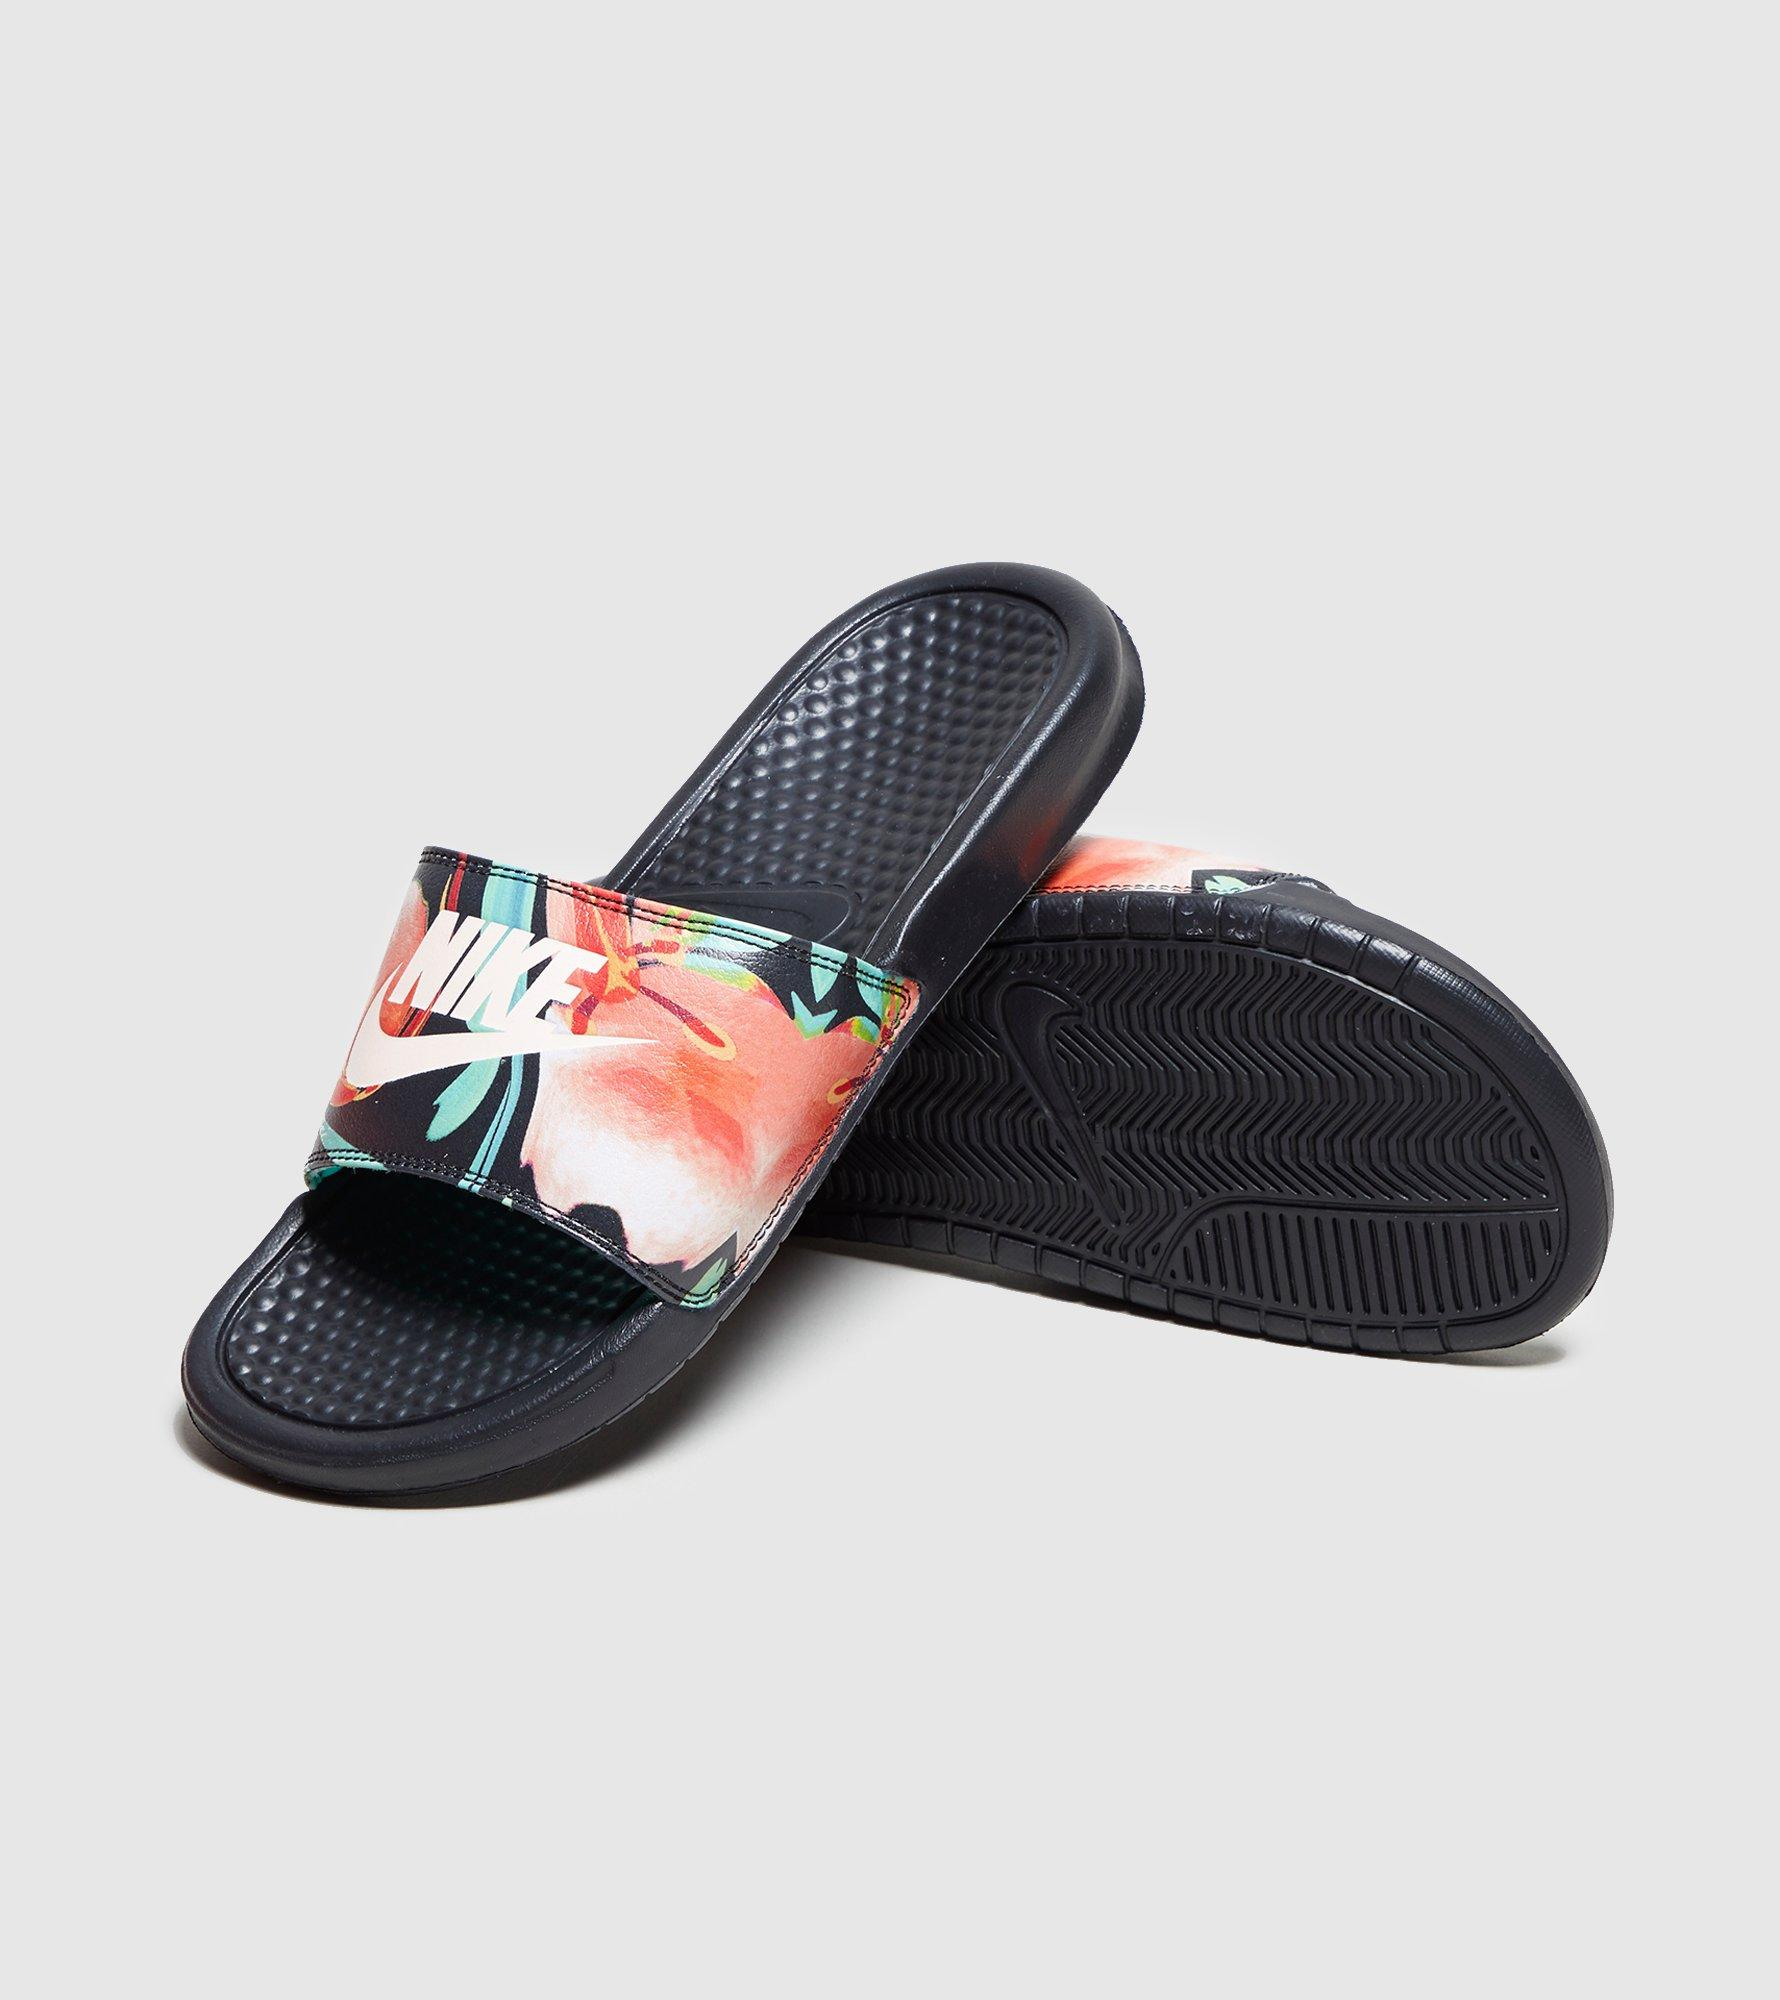 Nike Se Desliza Para Mujer Benassi comprar falso barato cómodo en línea comprar venta barata SAST barato MSGQxCPM